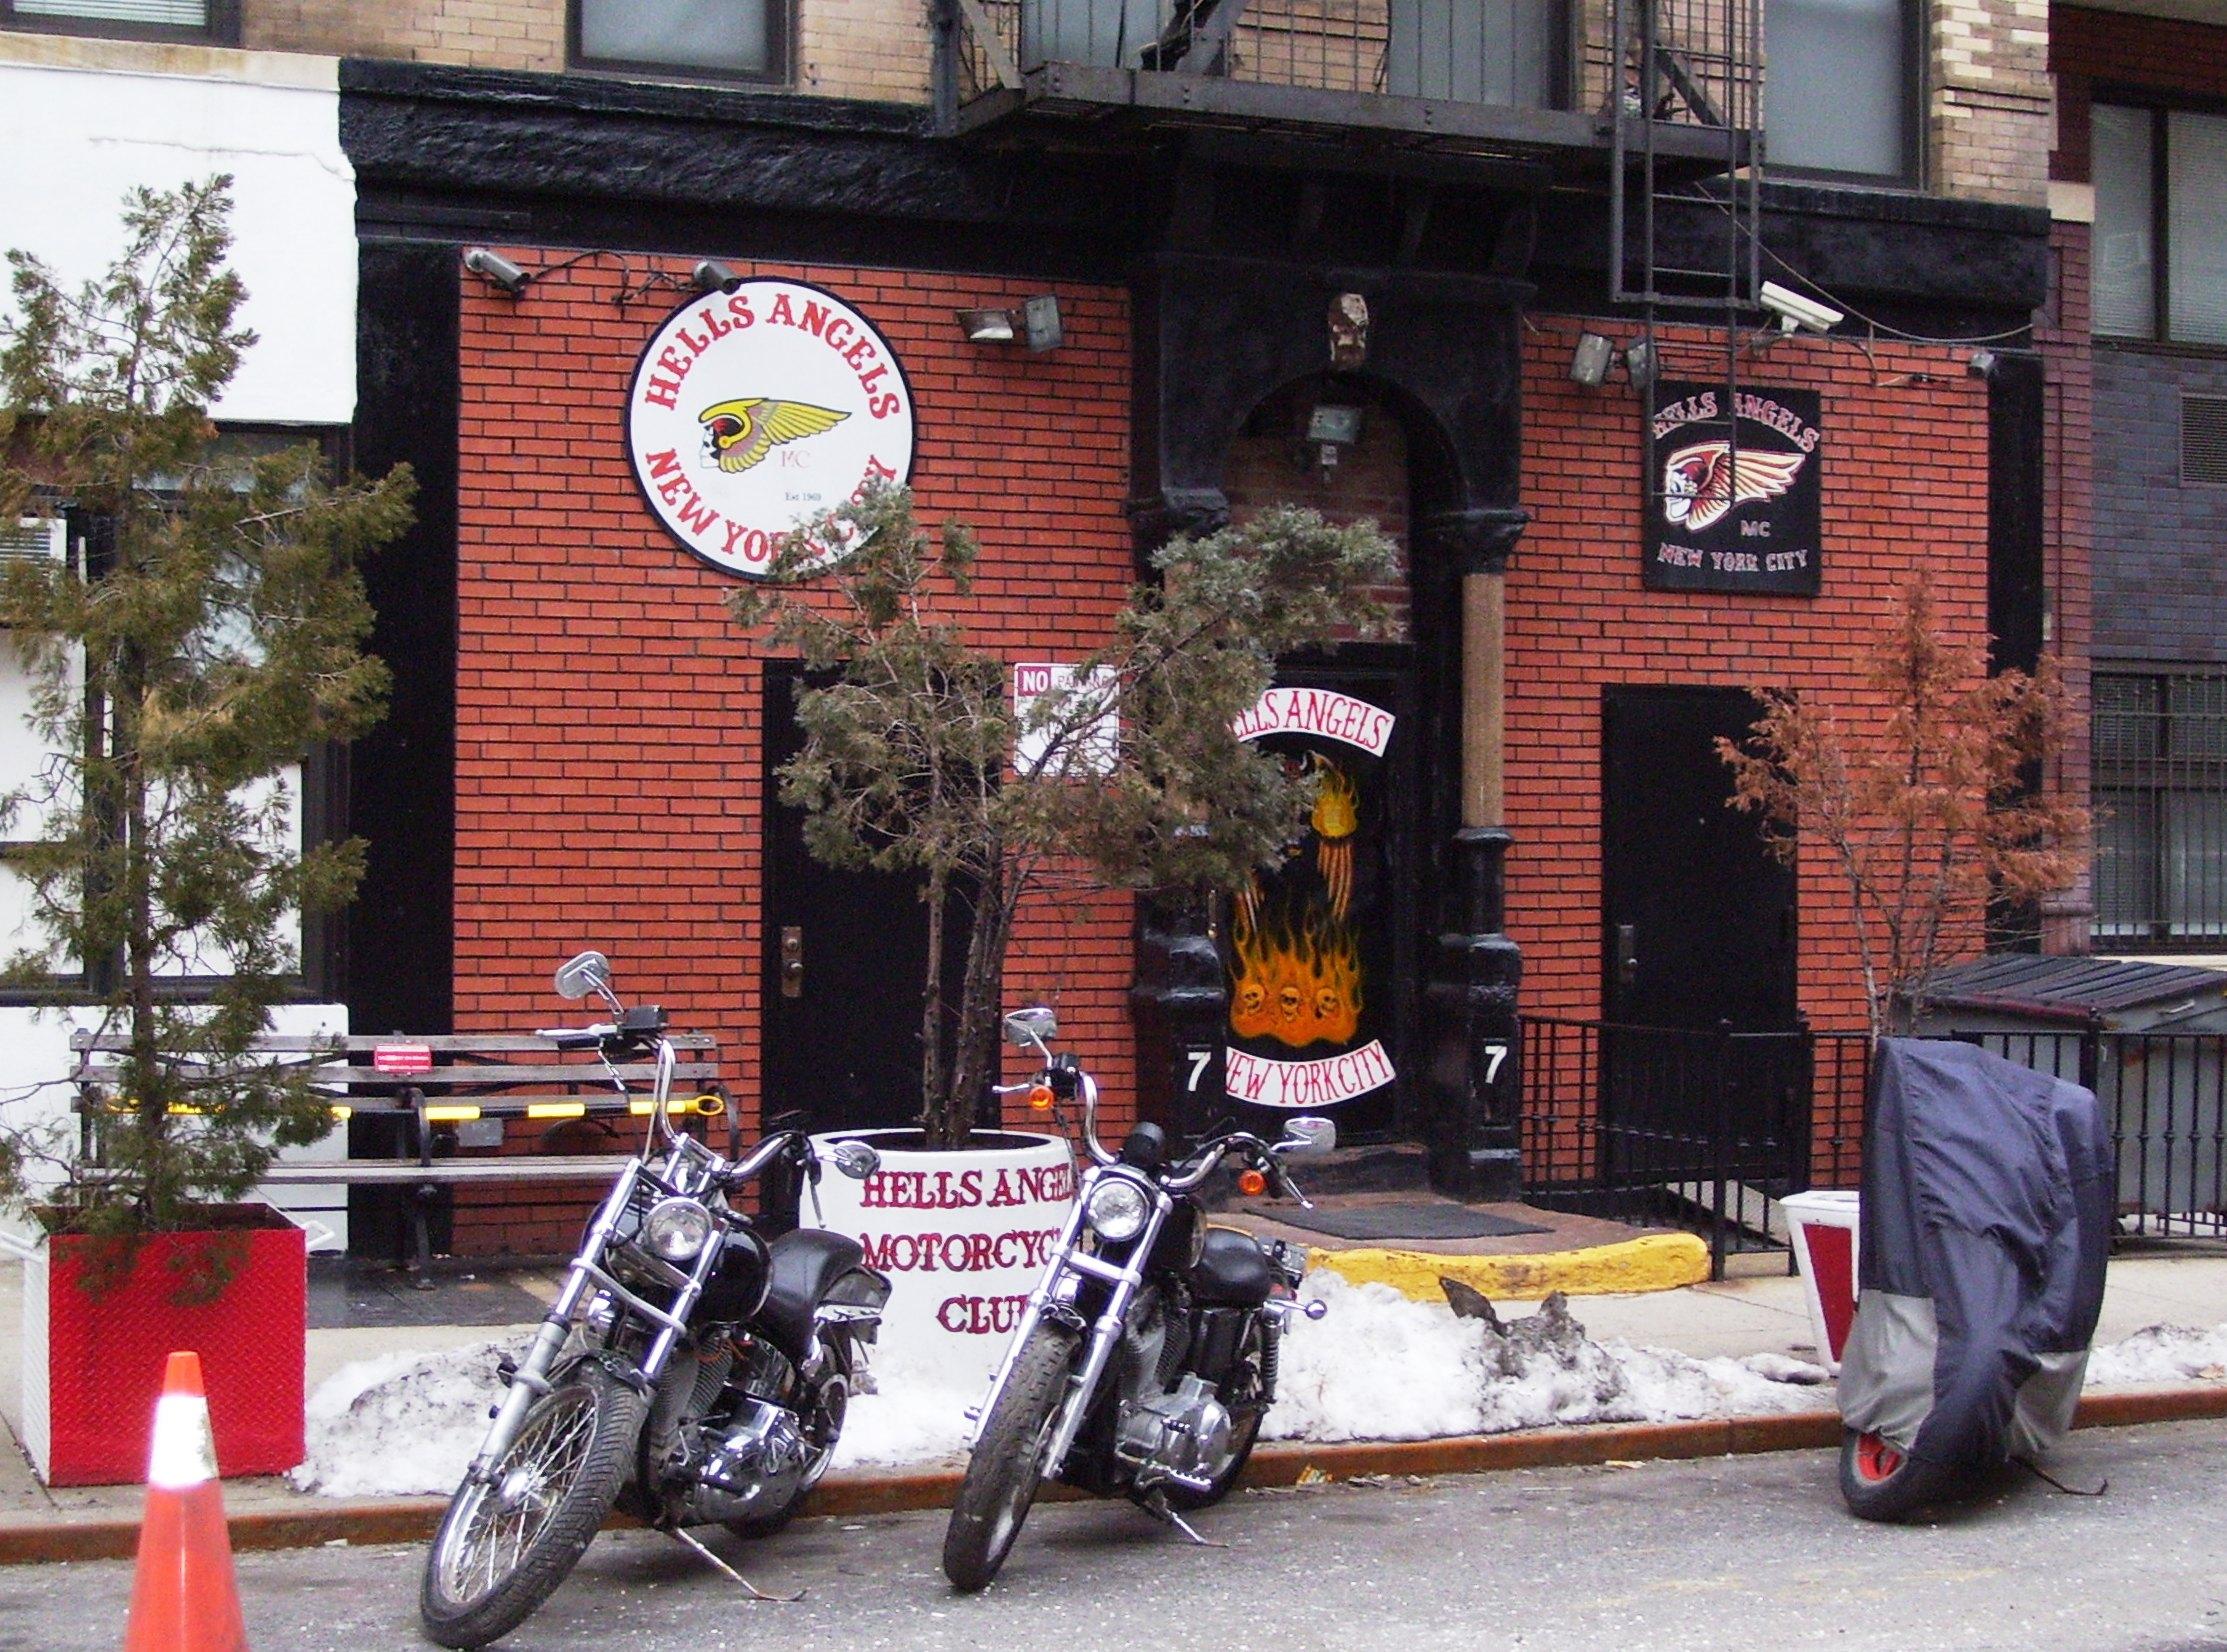 Hells Angels Mc Motorcycle Club One Percenter Bikers